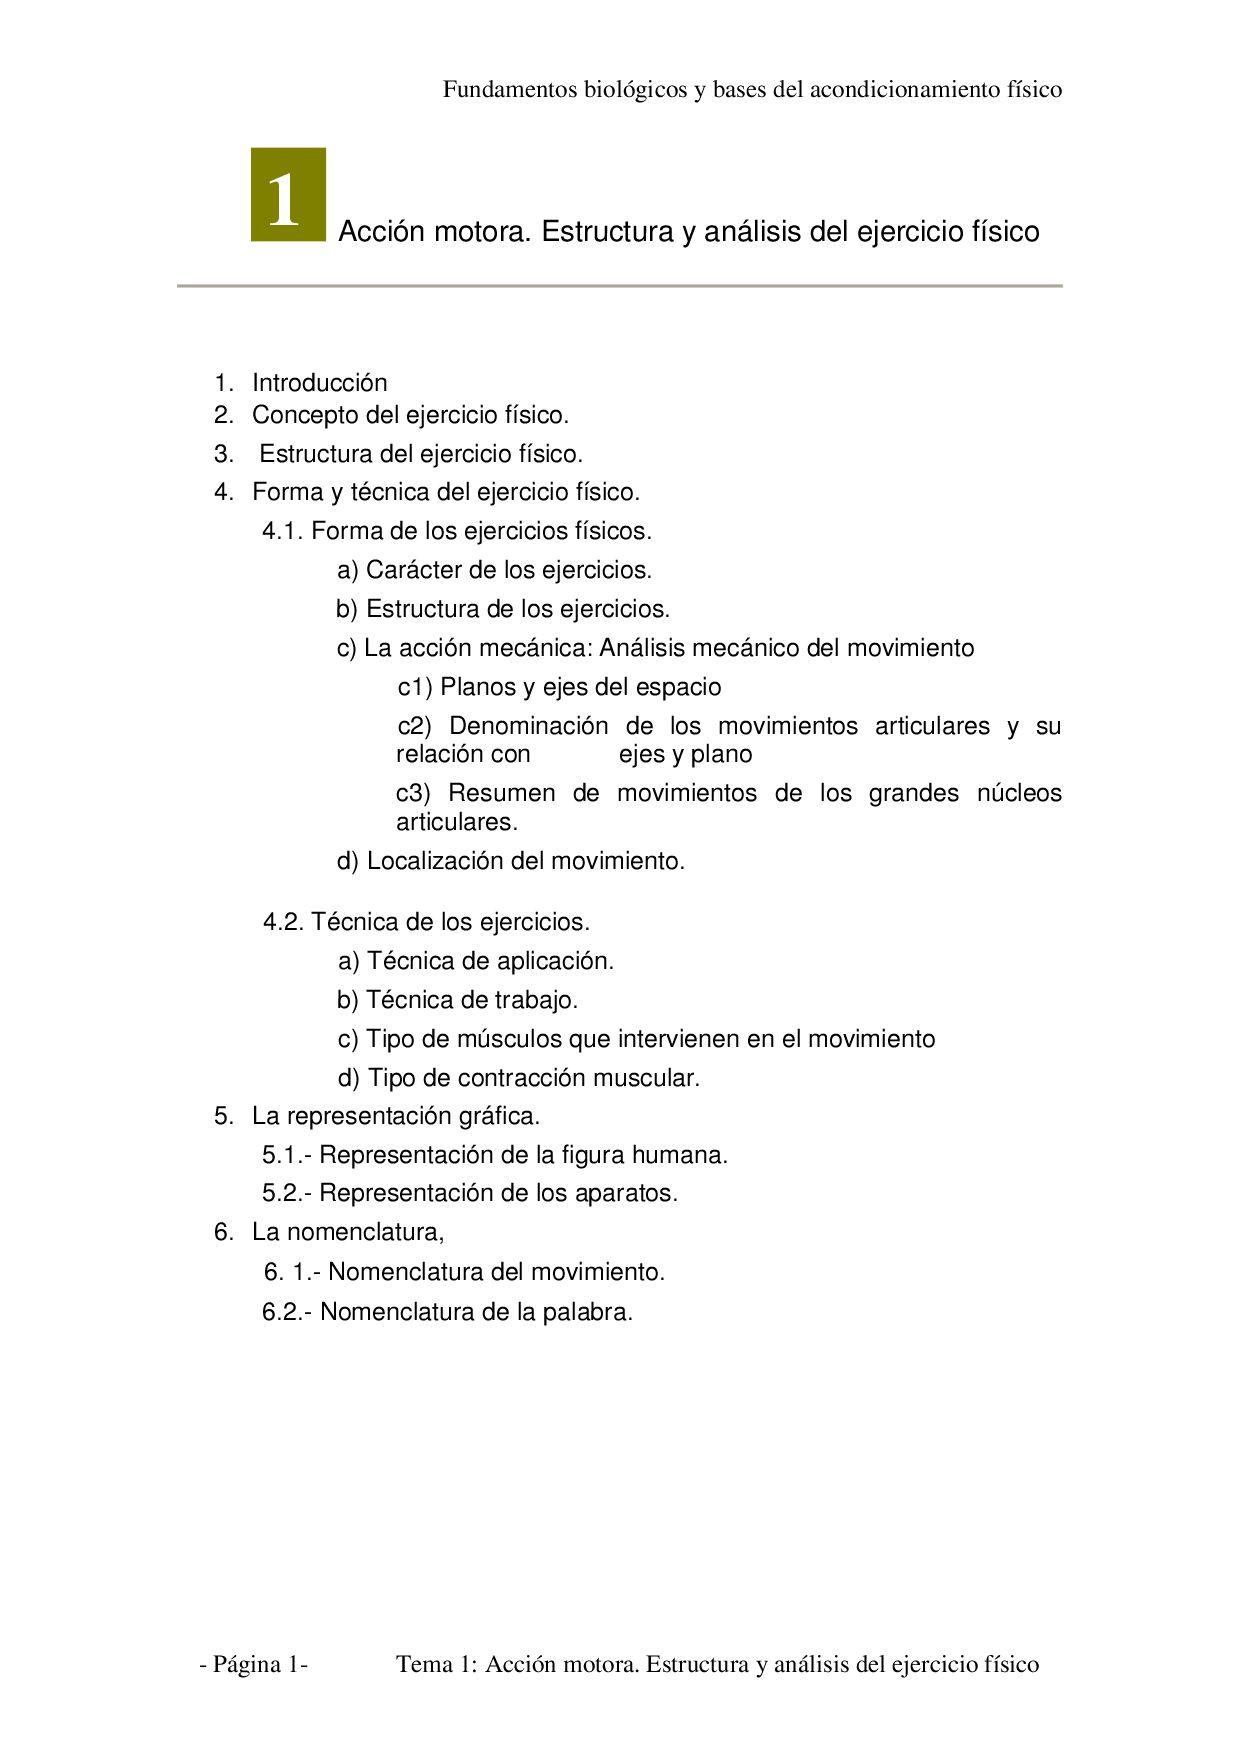 Tema 1 - Análisis de la acción motora by Marcos González Pérez - issuu